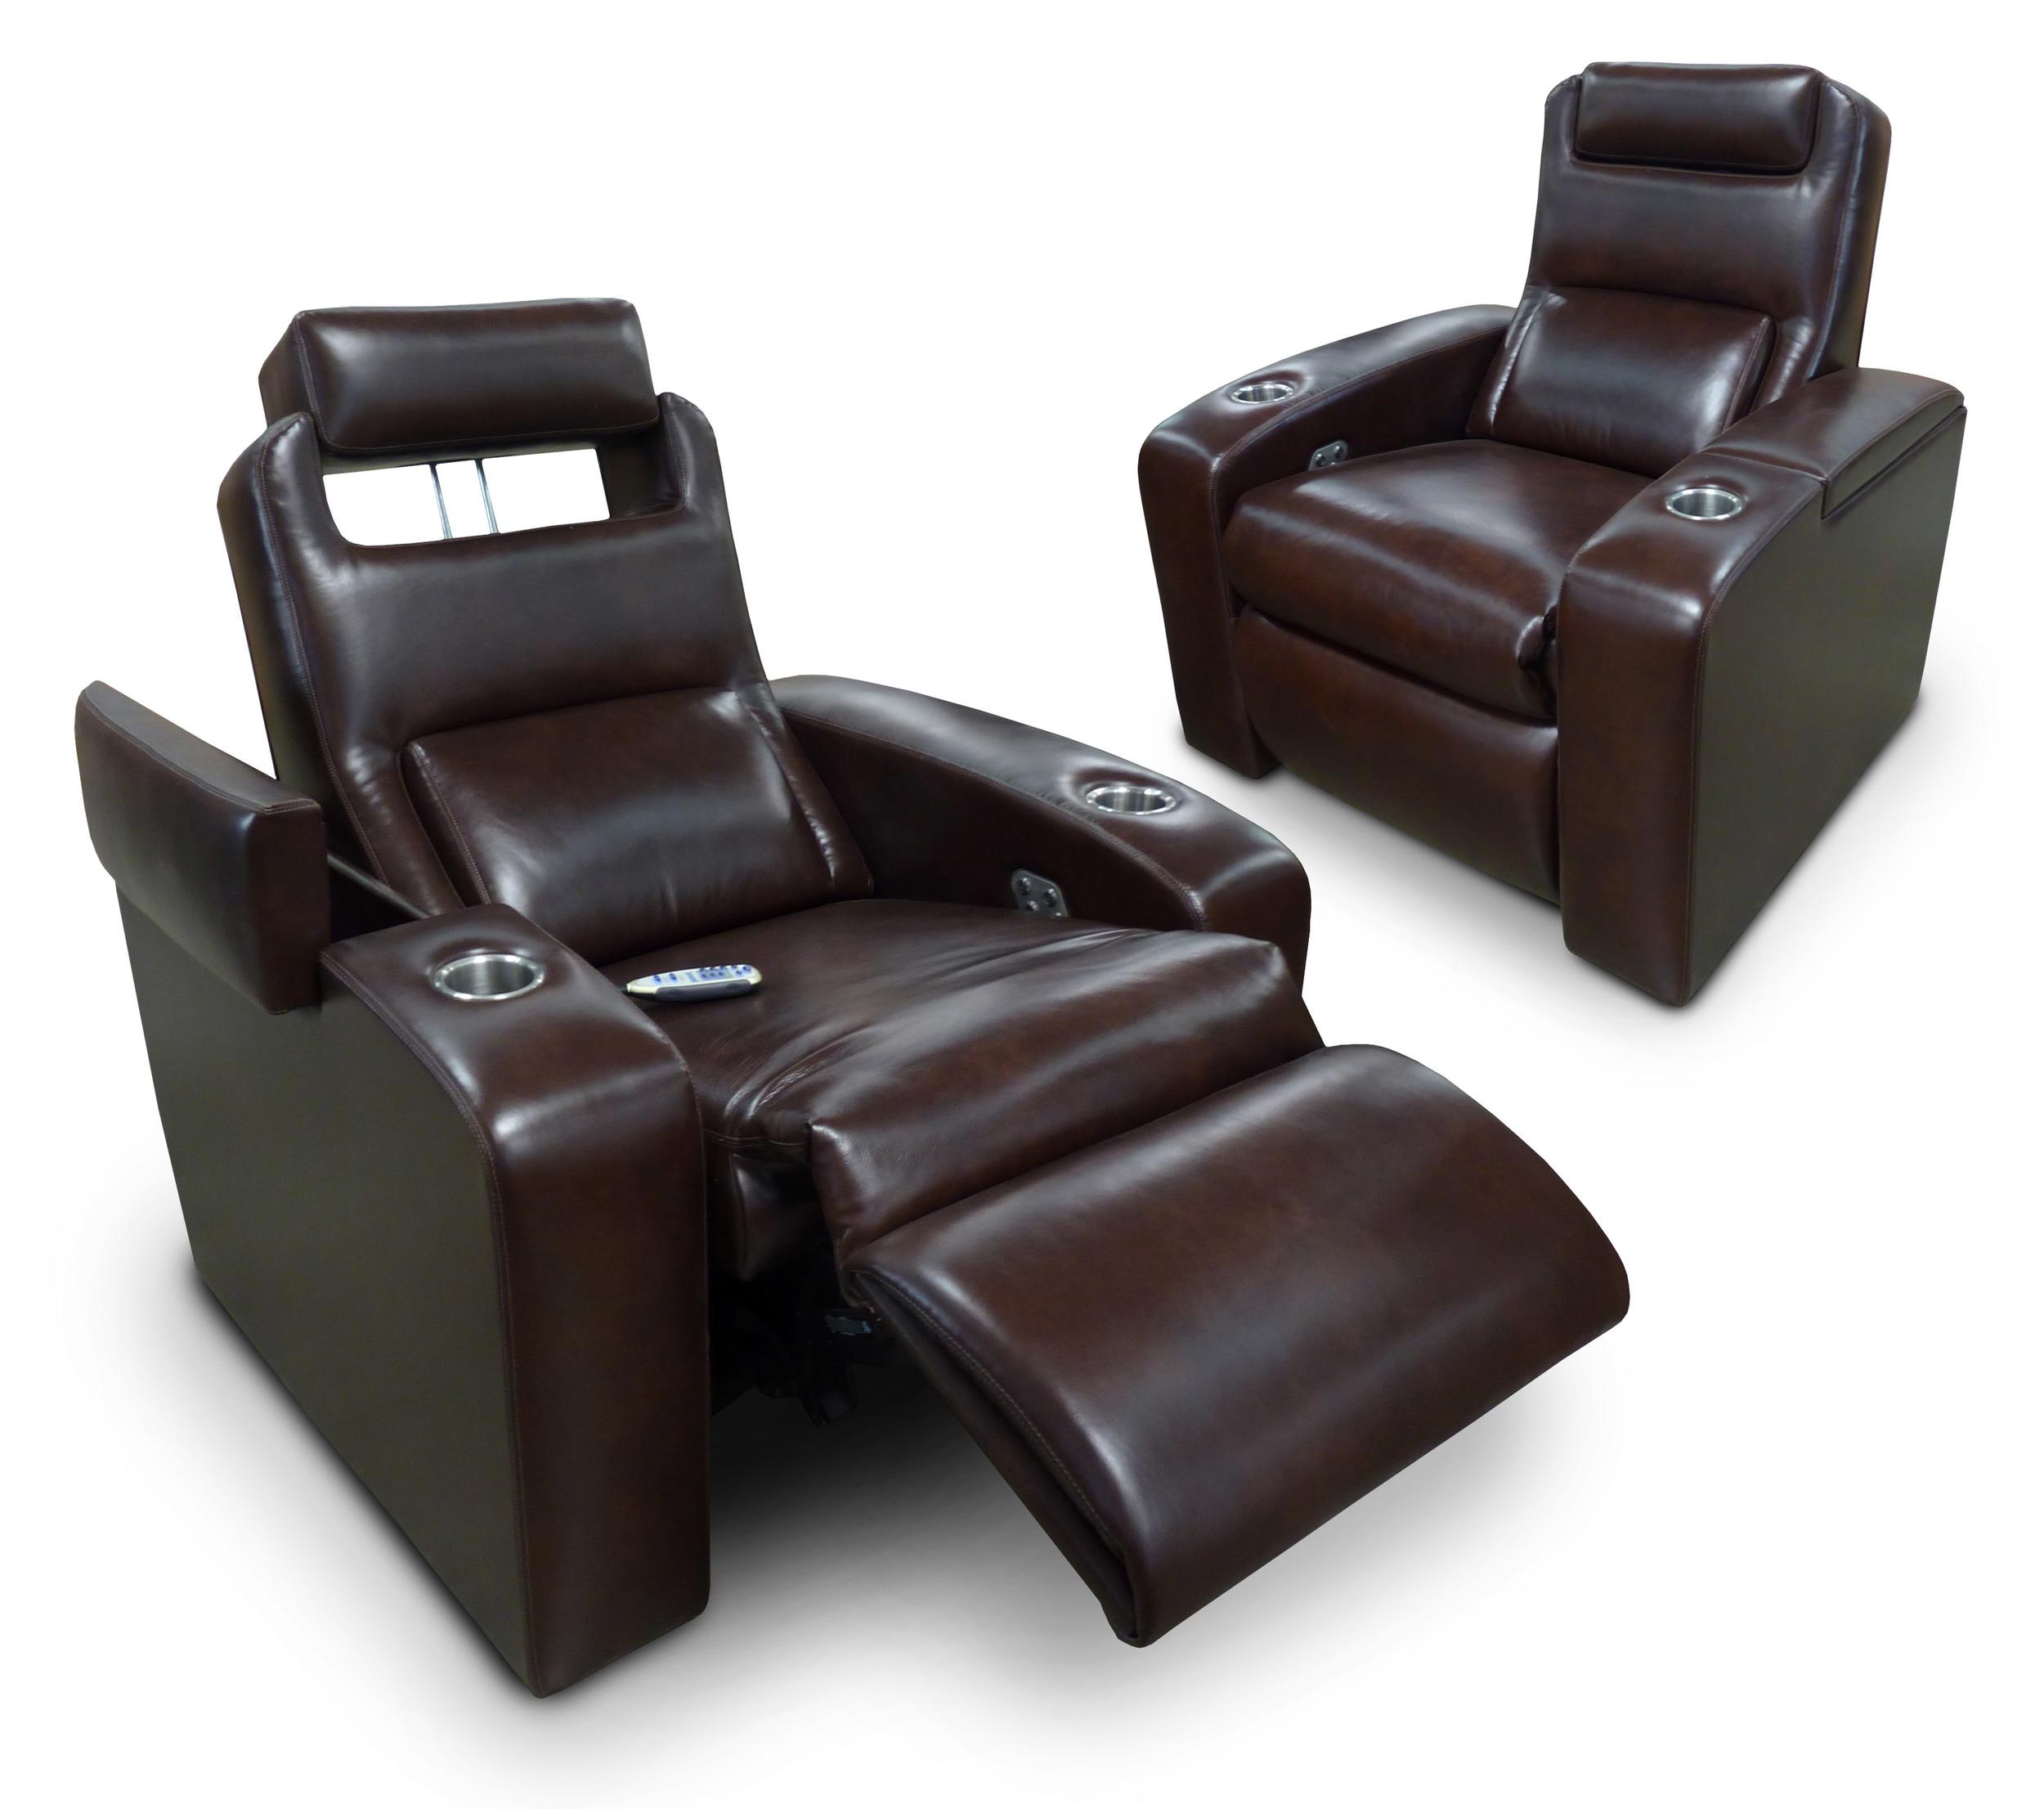 Motorized Adjustable Head Rest, Arm Storage, Chaise Footrest; Model: Madison